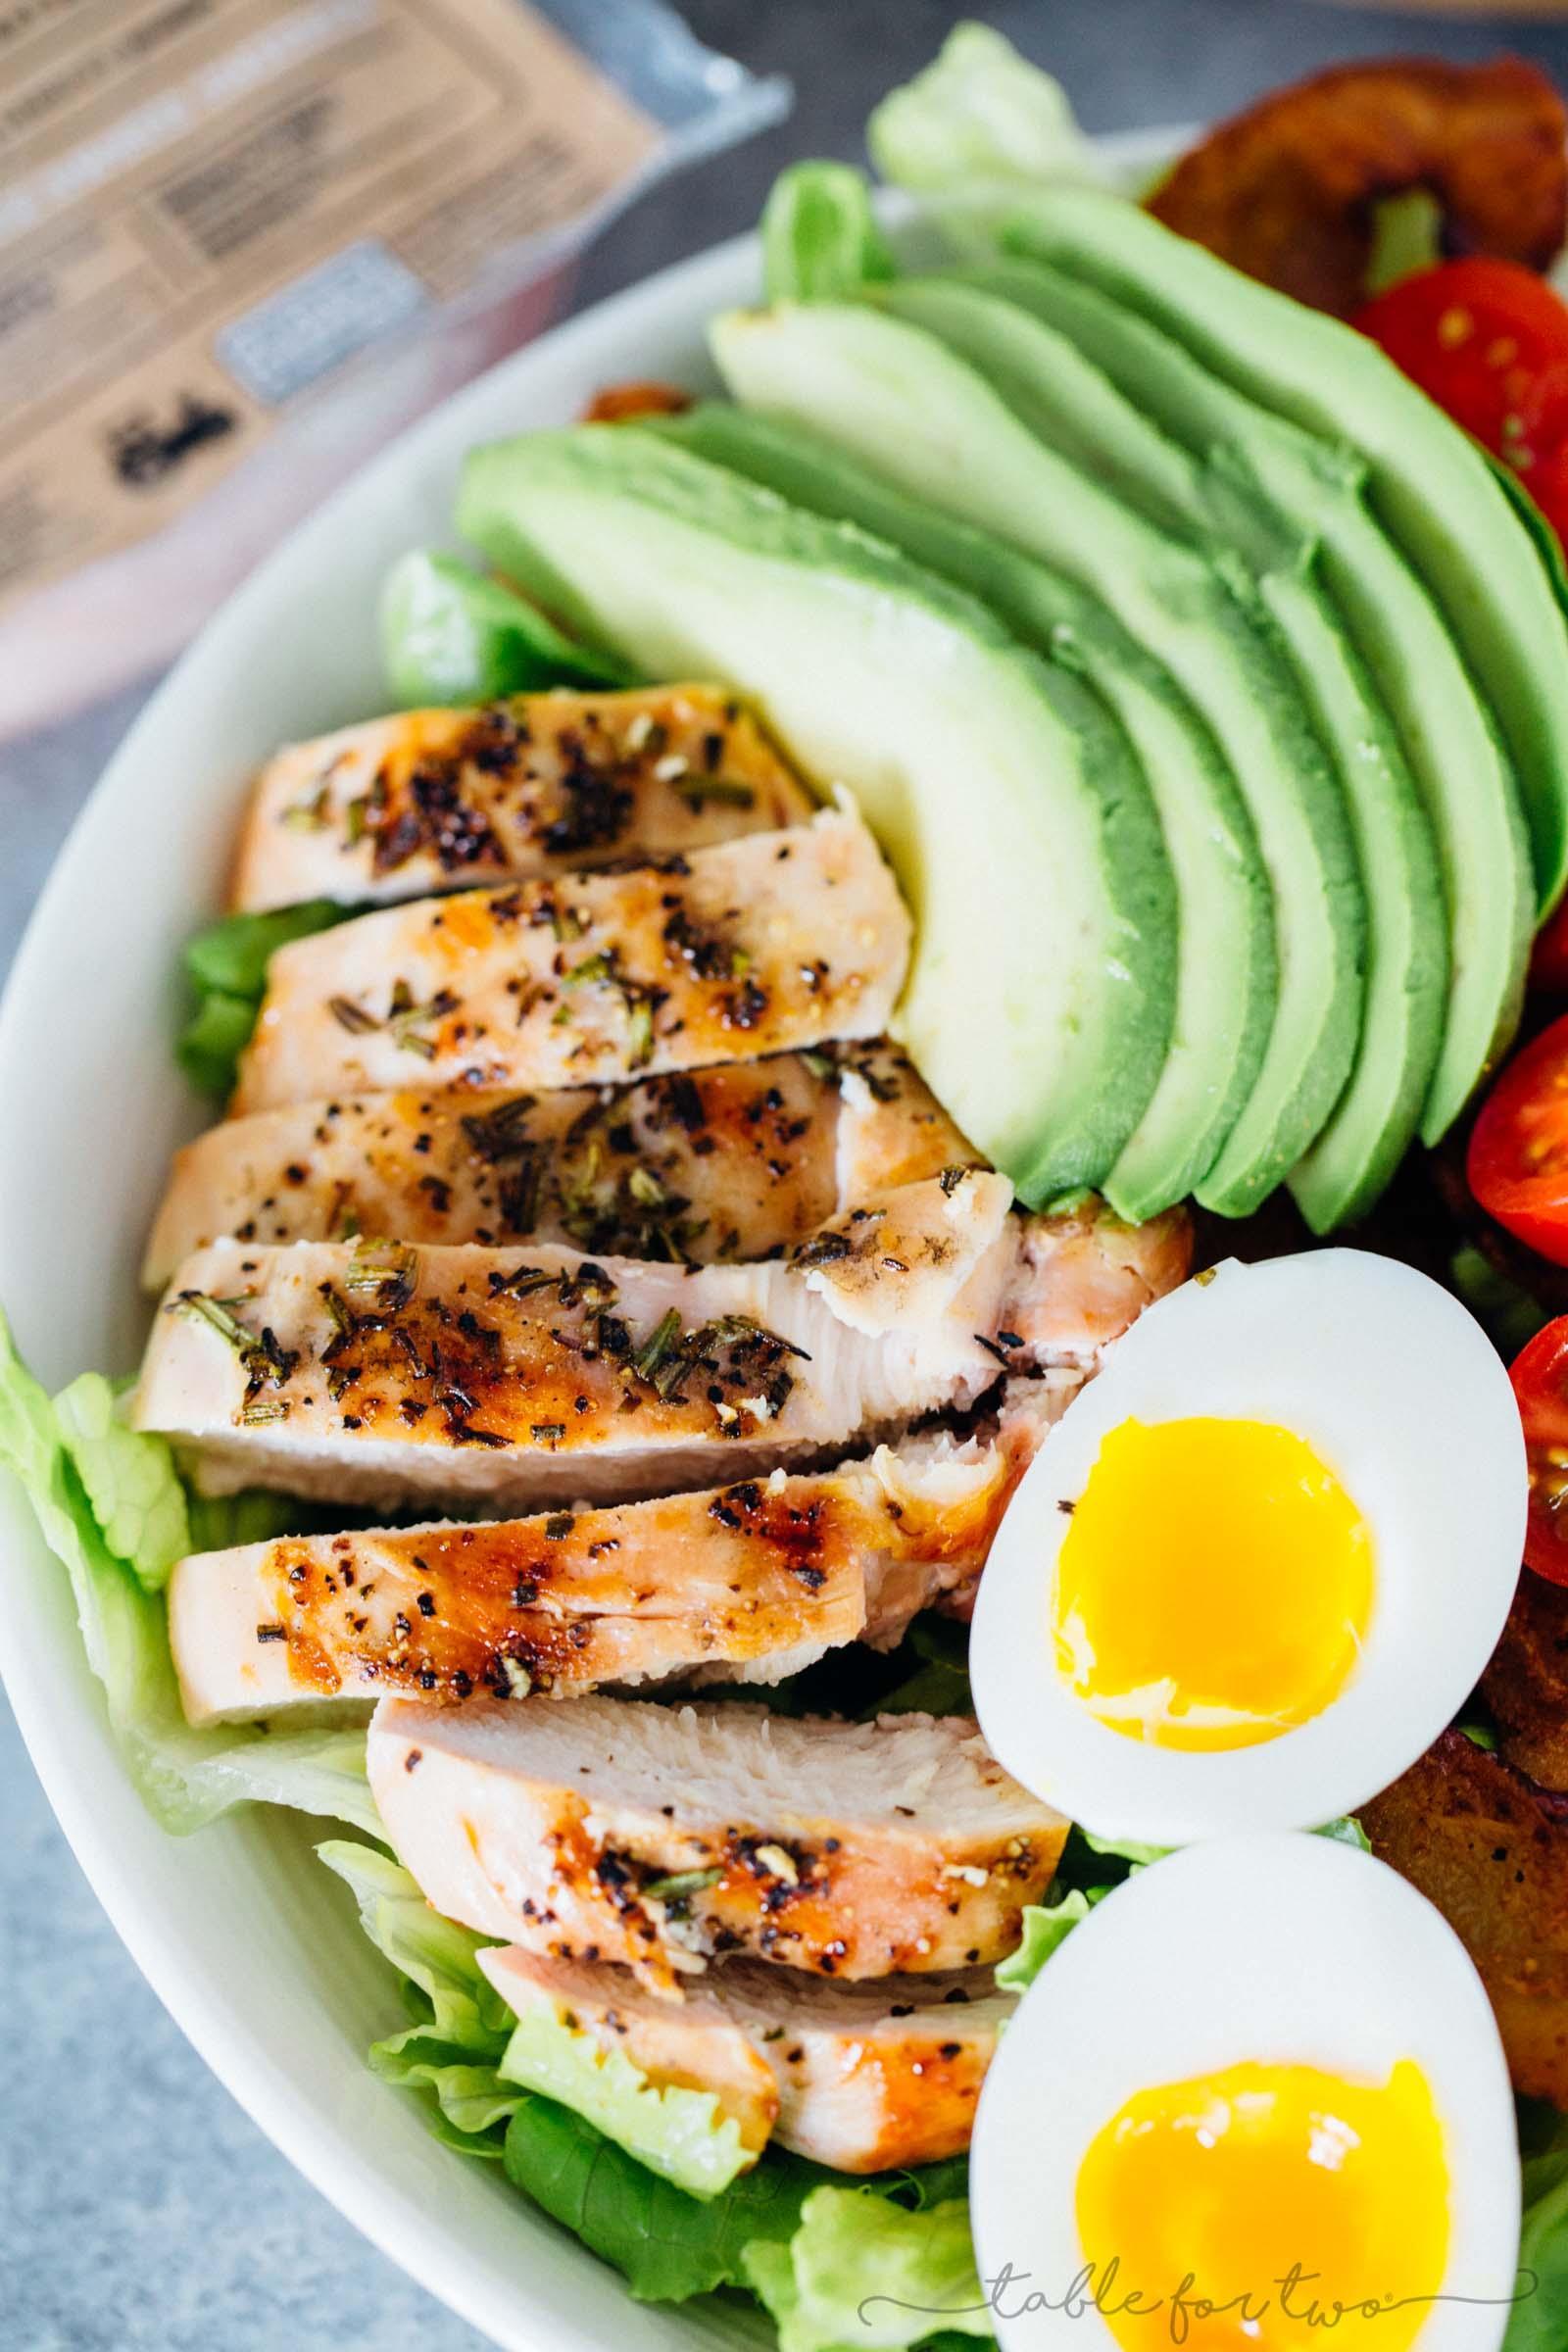 grilled-rosemary-chicken-photo-tablefortwoblog-7.jpg